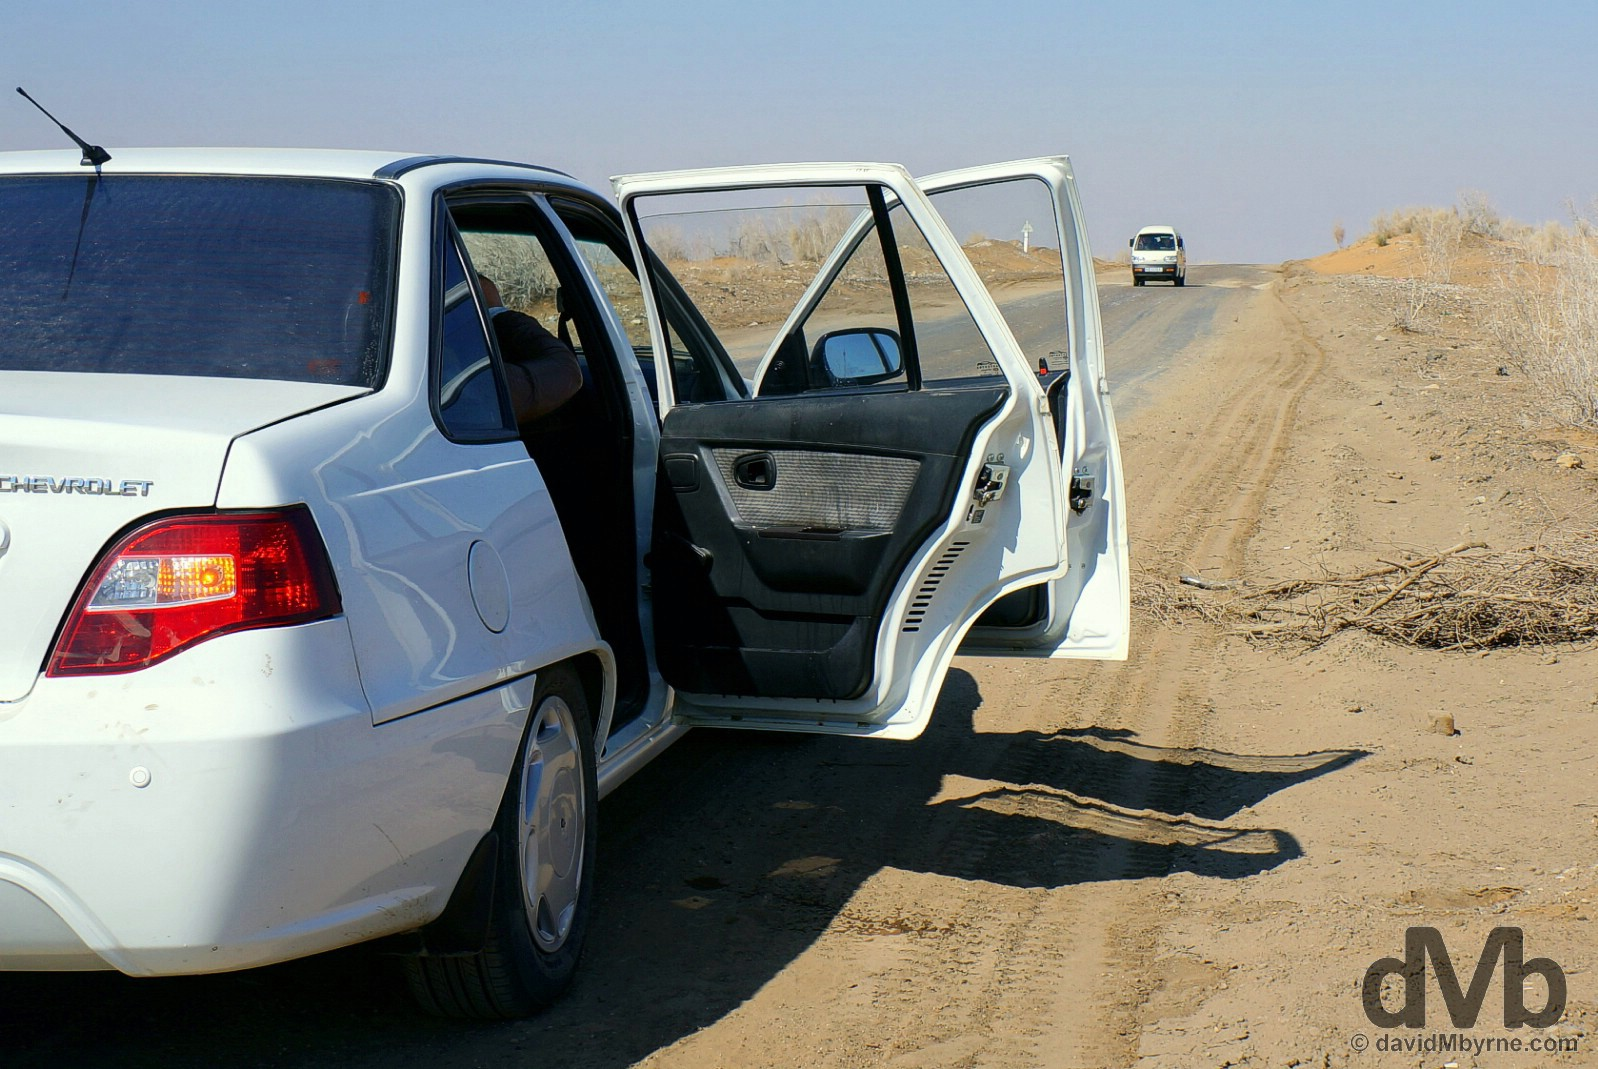 In the Kyzylkum Desert en route from Bukhara to Khiva, Uzbekistan. March 13, 2015.